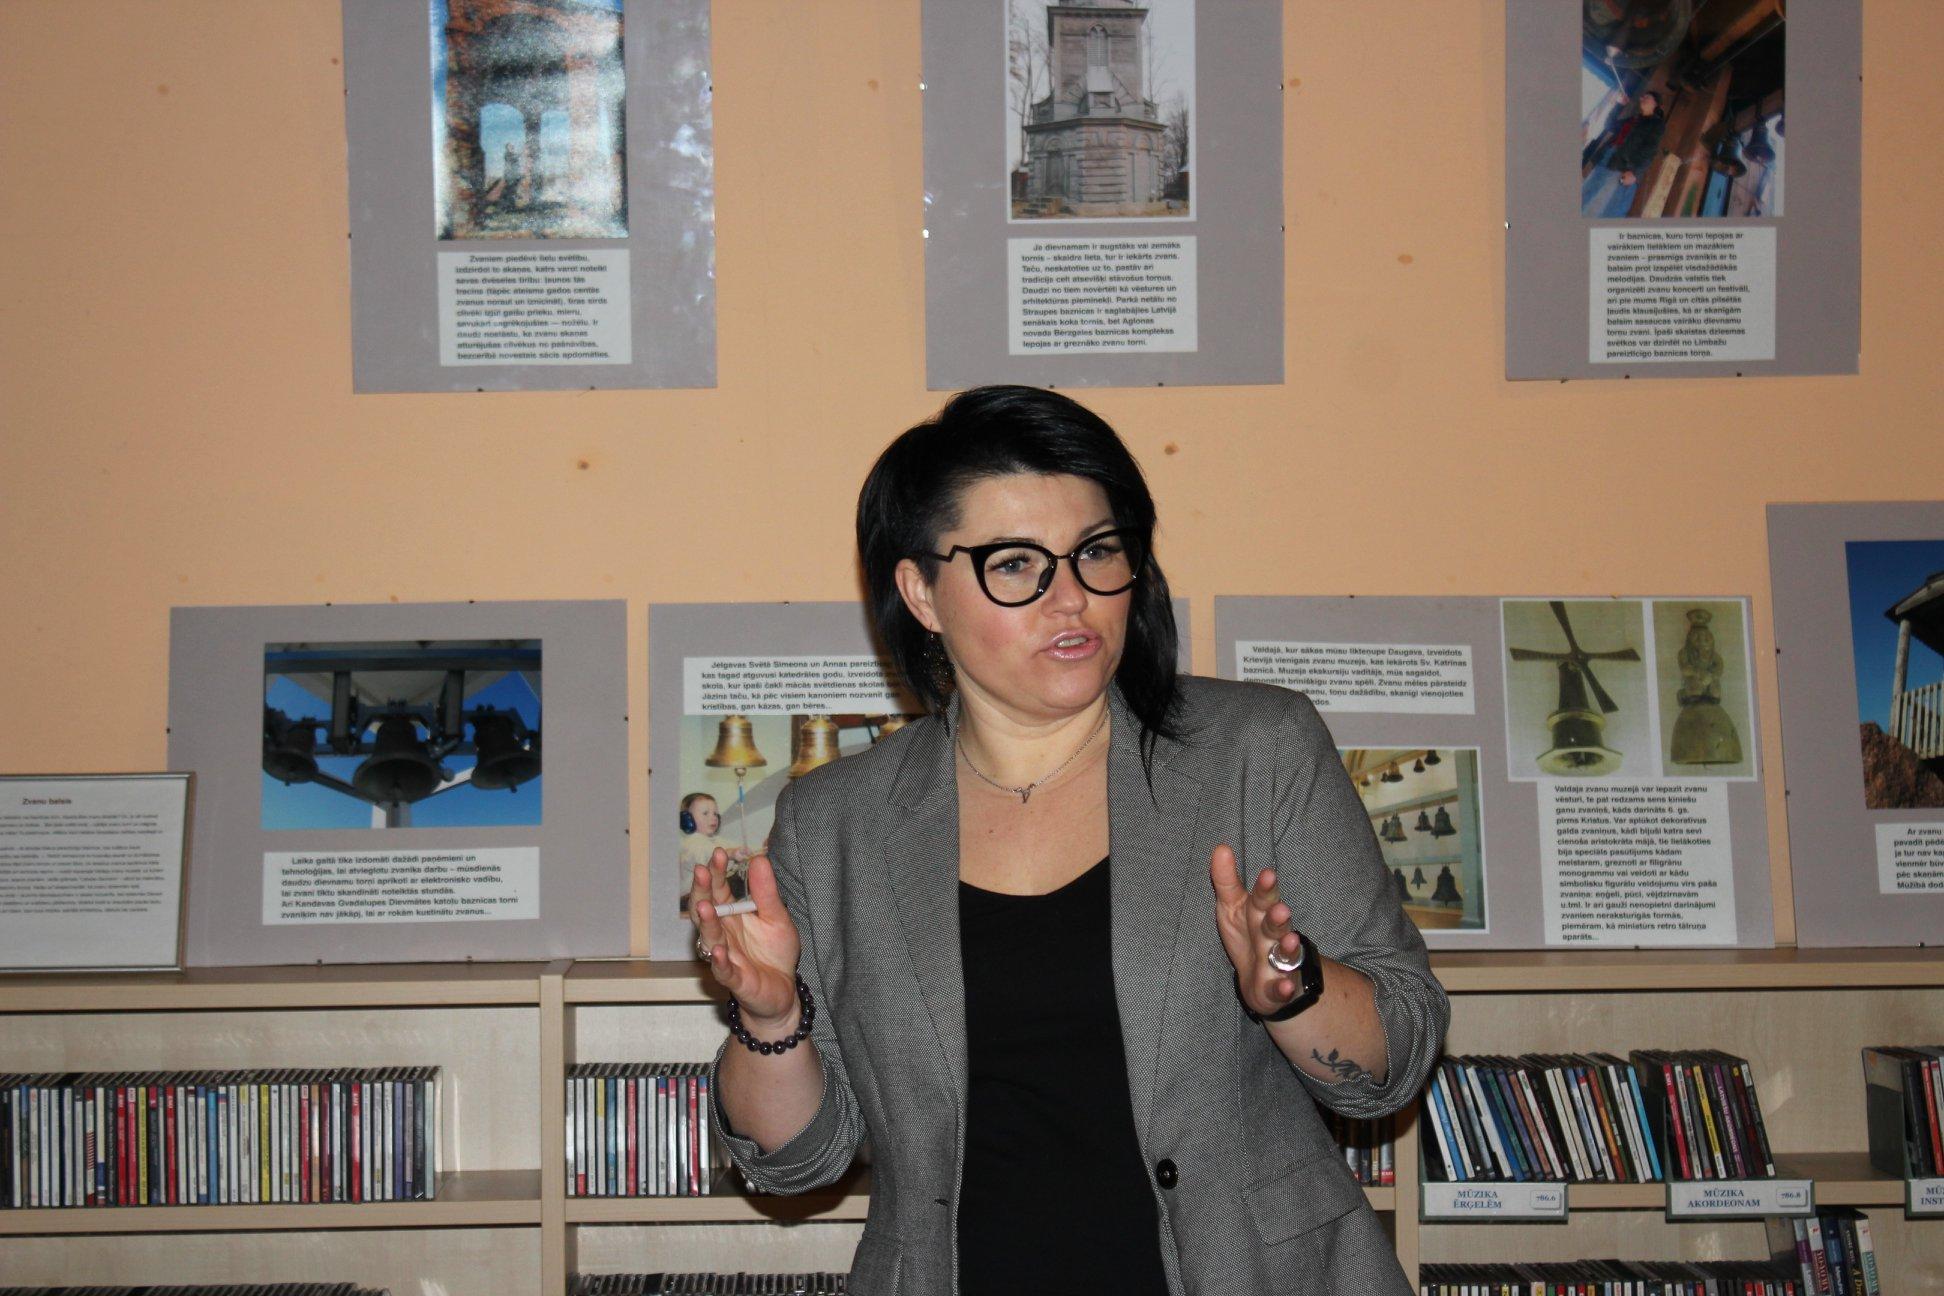 LNB statistikas eksperte Diāna Rudzīte